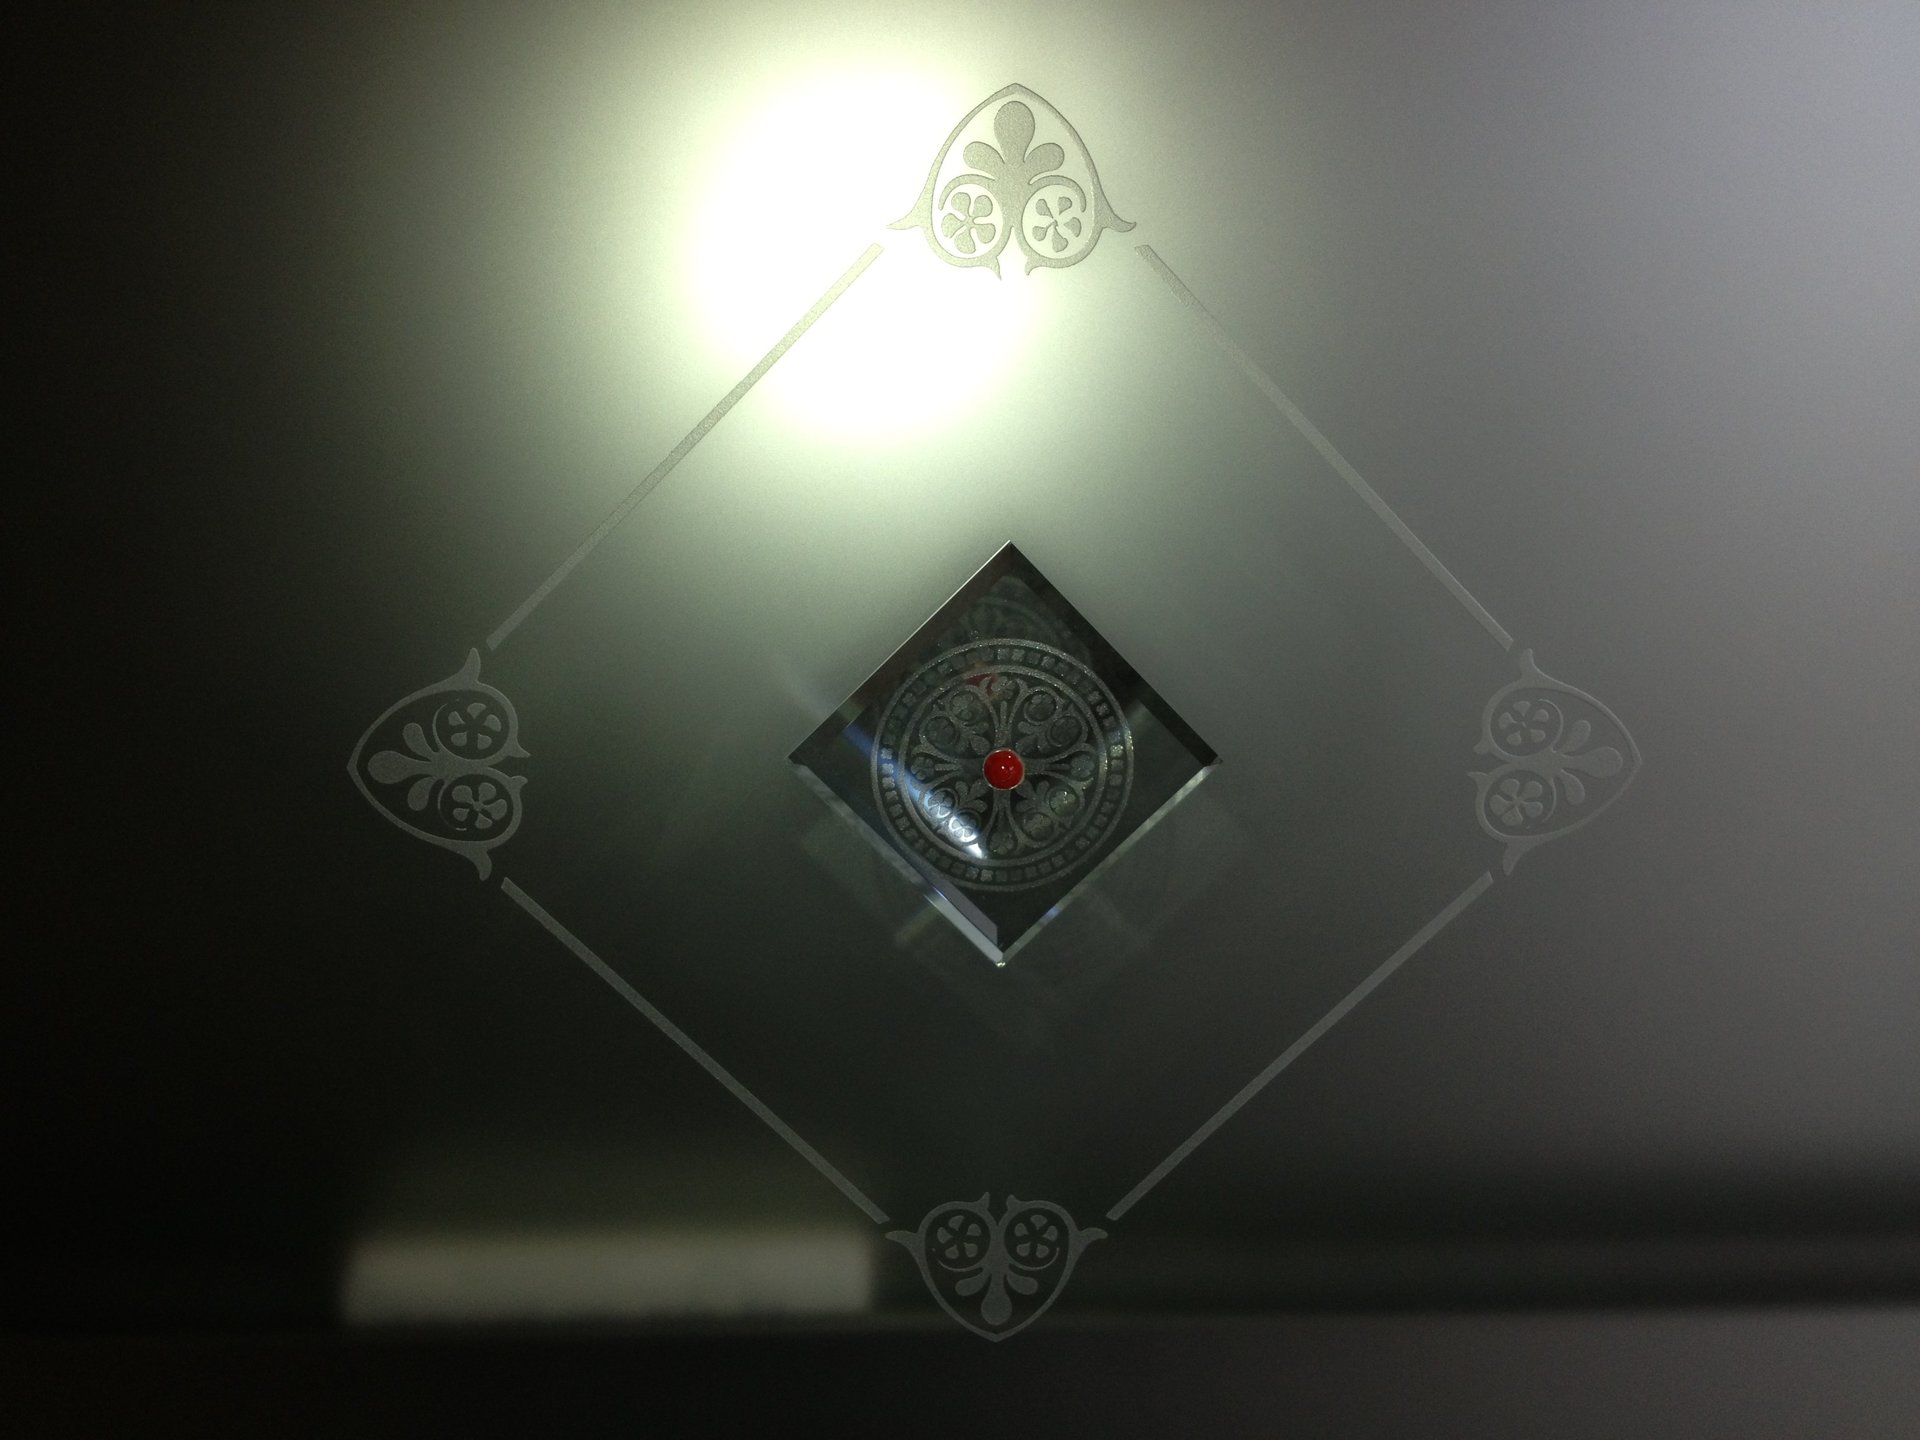 vetri antisfondamento, vetri infrangibili, arredi in vetro